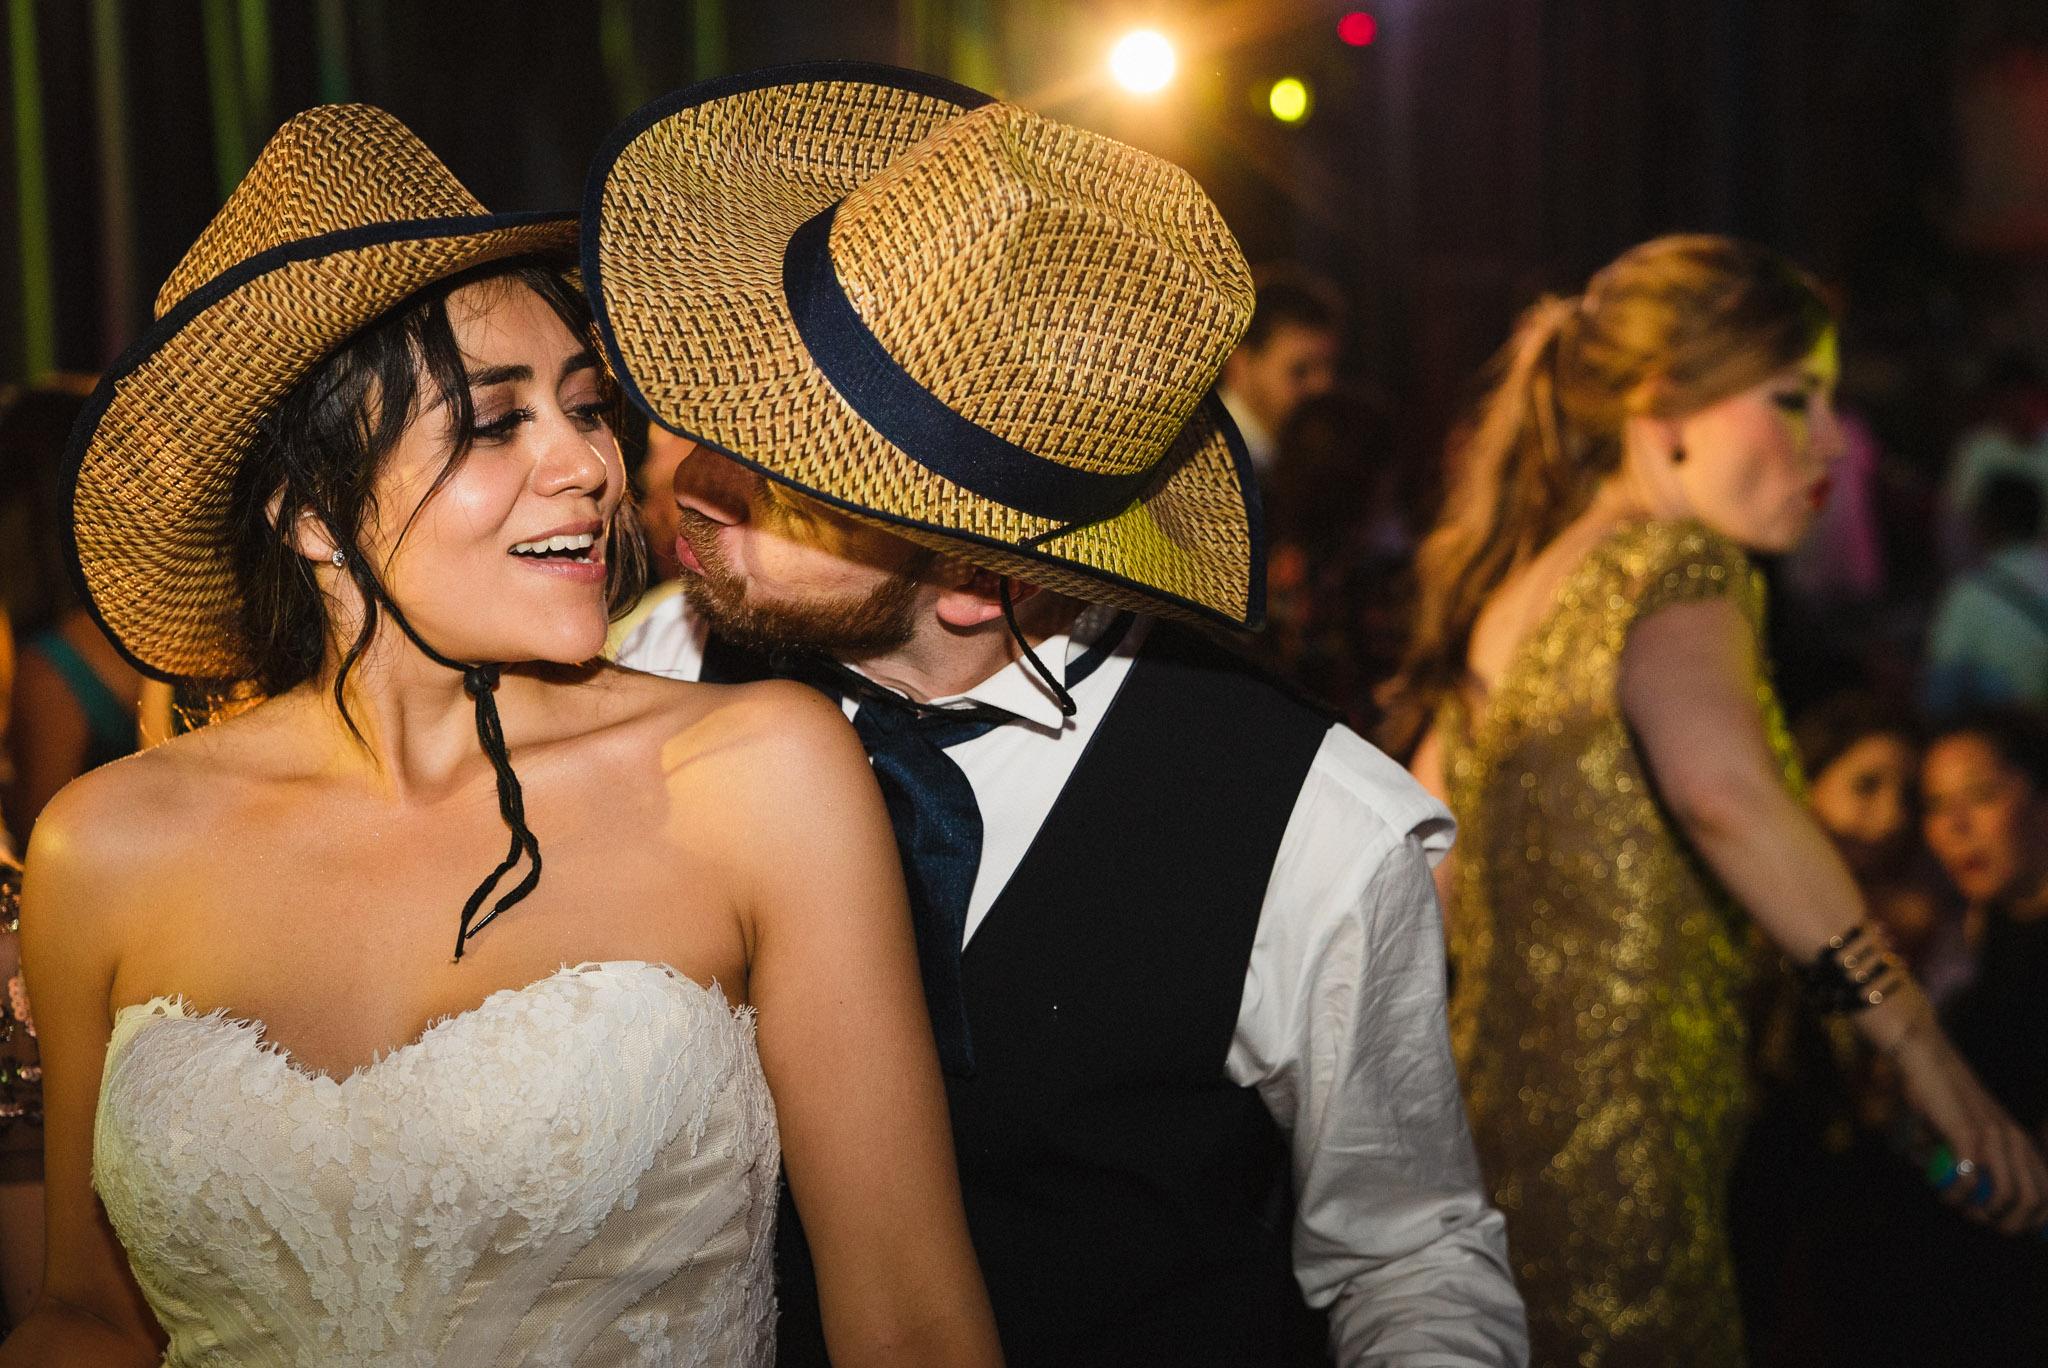 ©www.mauriziosolisbroca.com-20161002maurizio-solis-broca-mexico-canada-wedding-photographer20161002DSC00742-Edit.jpg